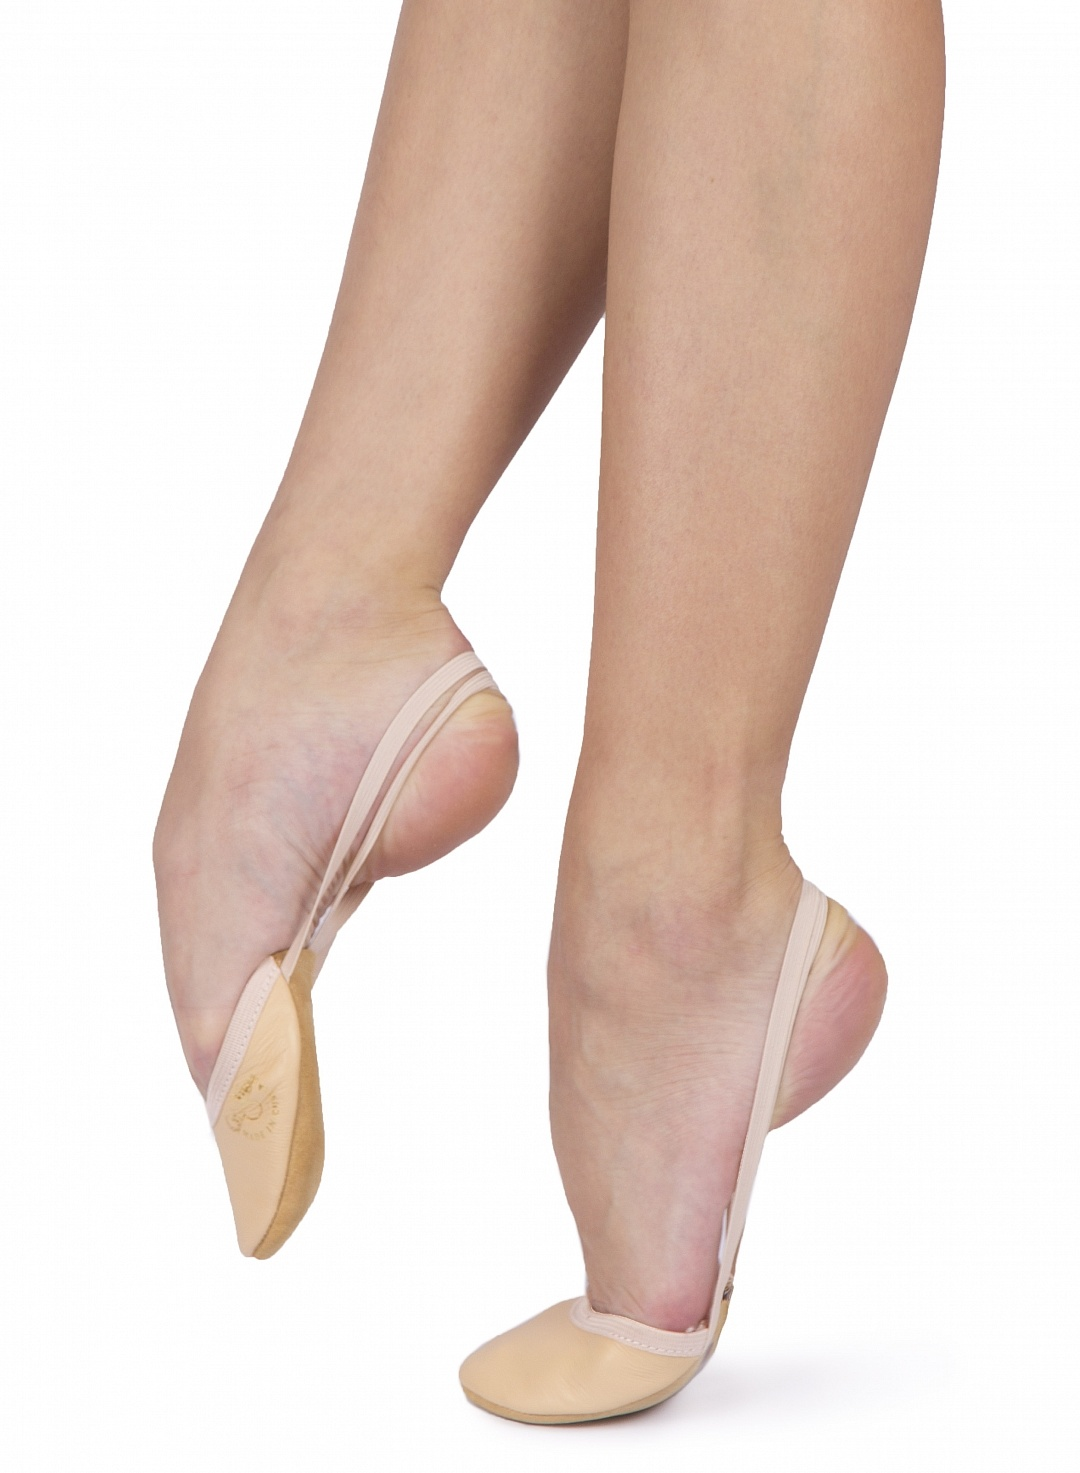 GRISHKO ALINA LEATHER HALF SOLE SHOES (3052L)